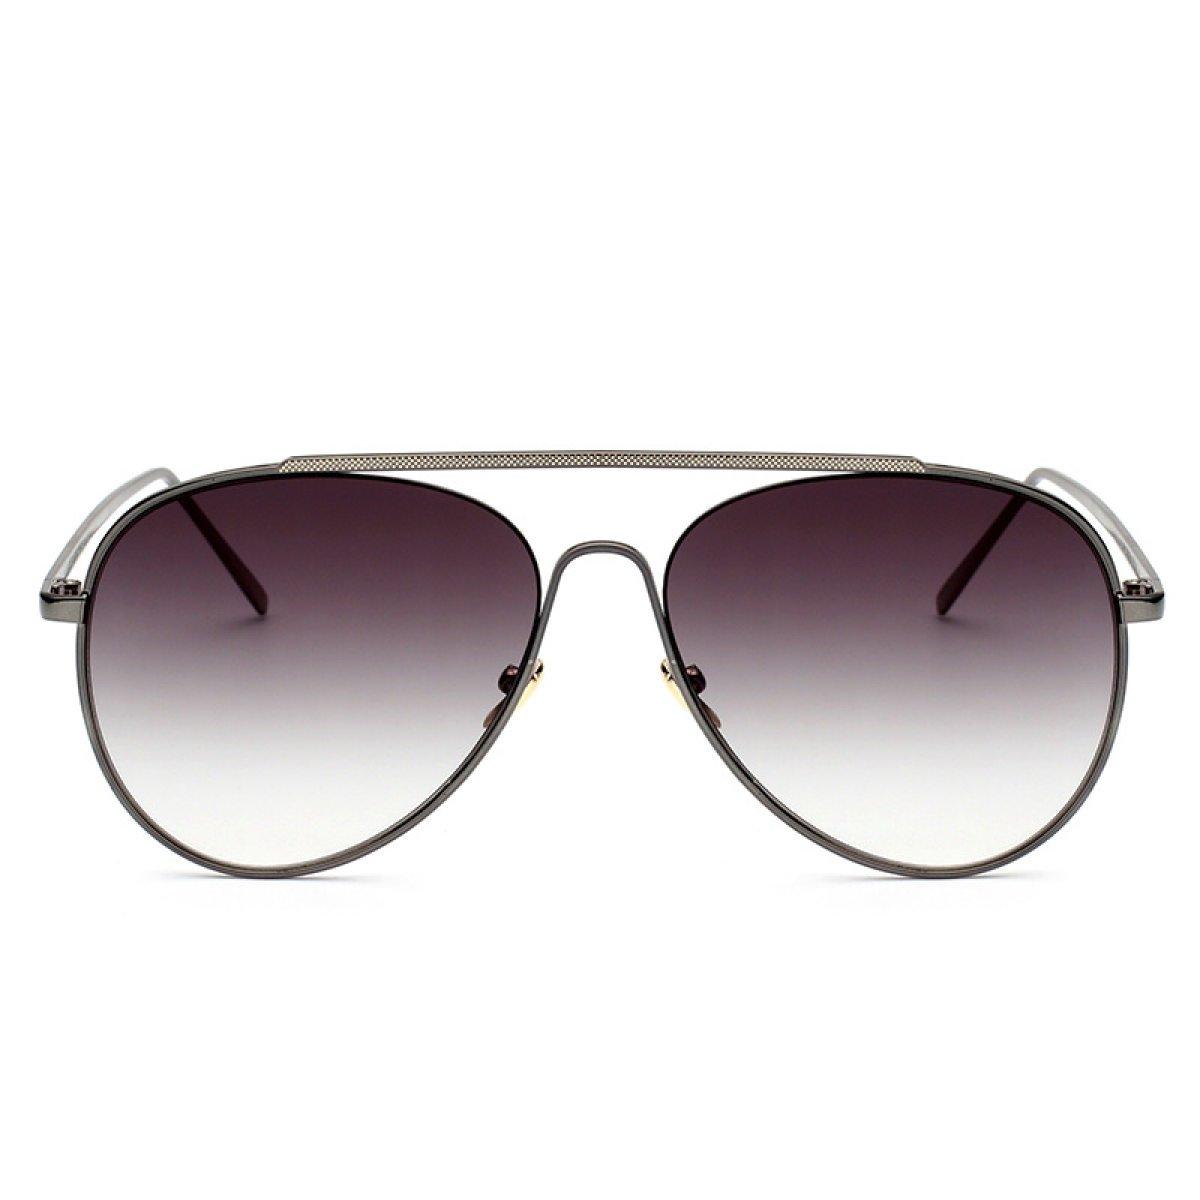 Wkaijc Yurt Mode Persönlichkeit Bequem Elegant Metall Große Kiste Sonnenbrille Fahrer-Sonnenbrille,B